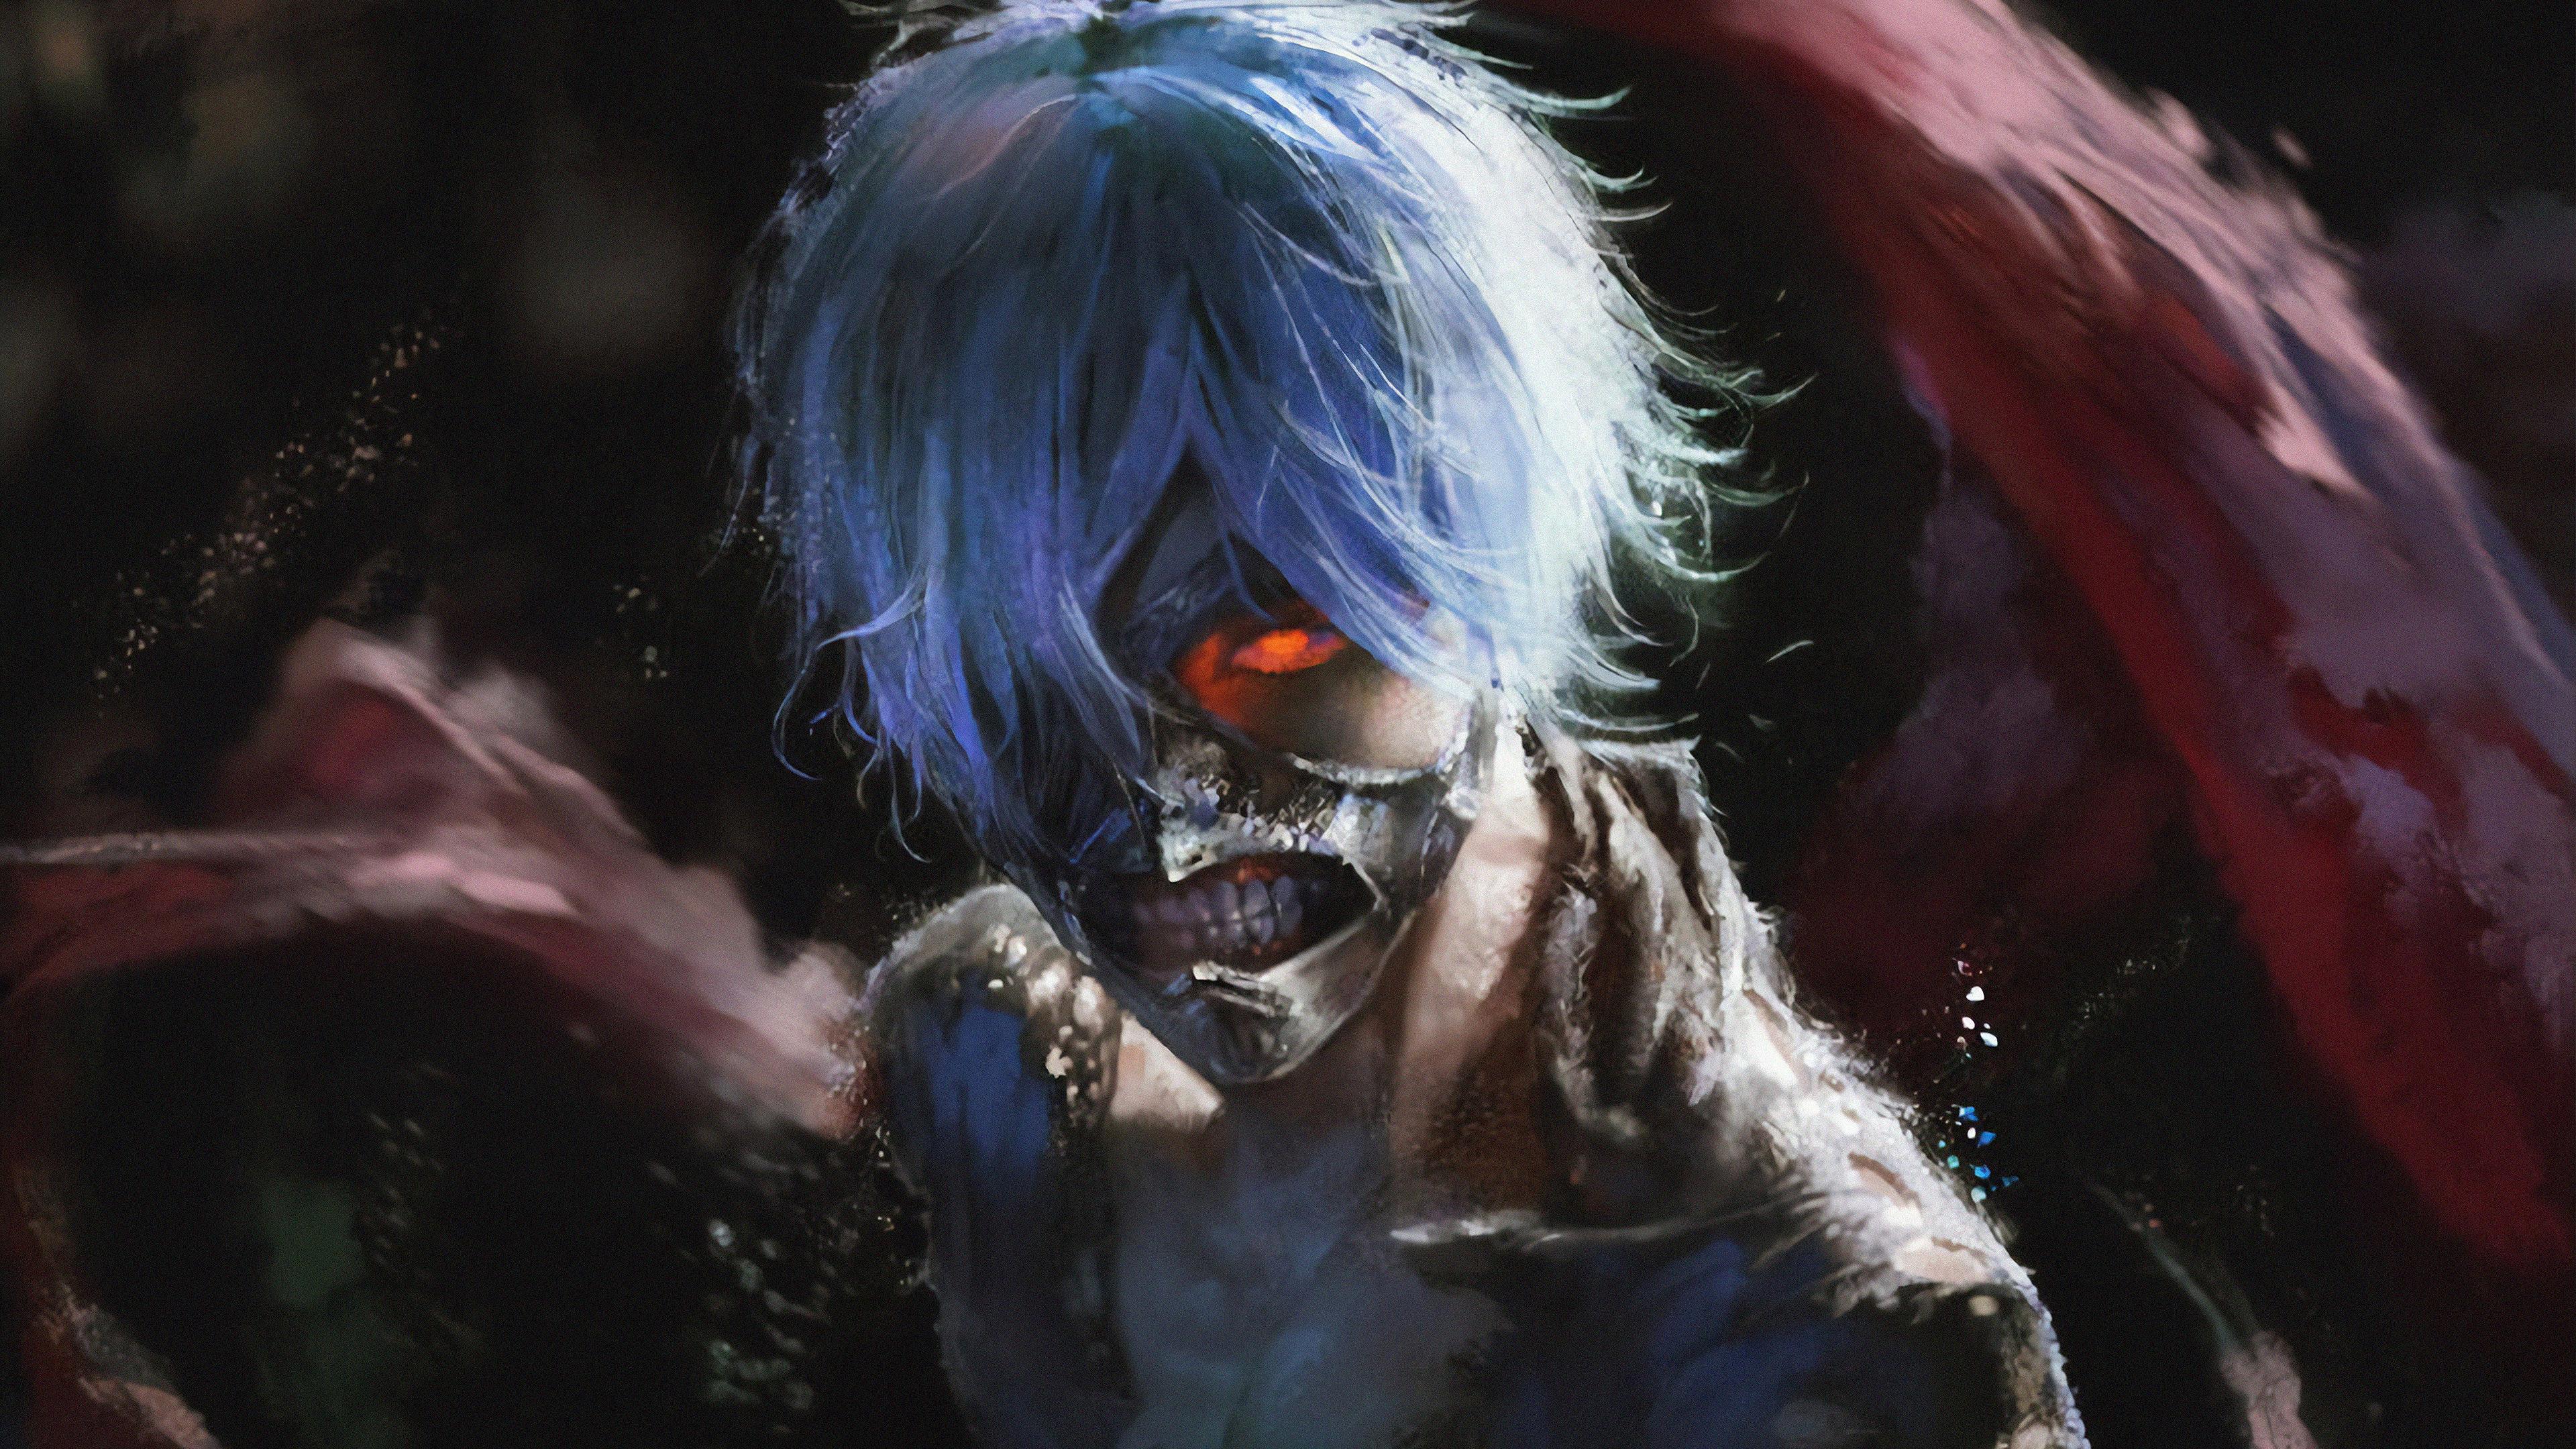 1366x768 Tokyo Ghoul Art 4k 1366x768 Resolution Hd 4k